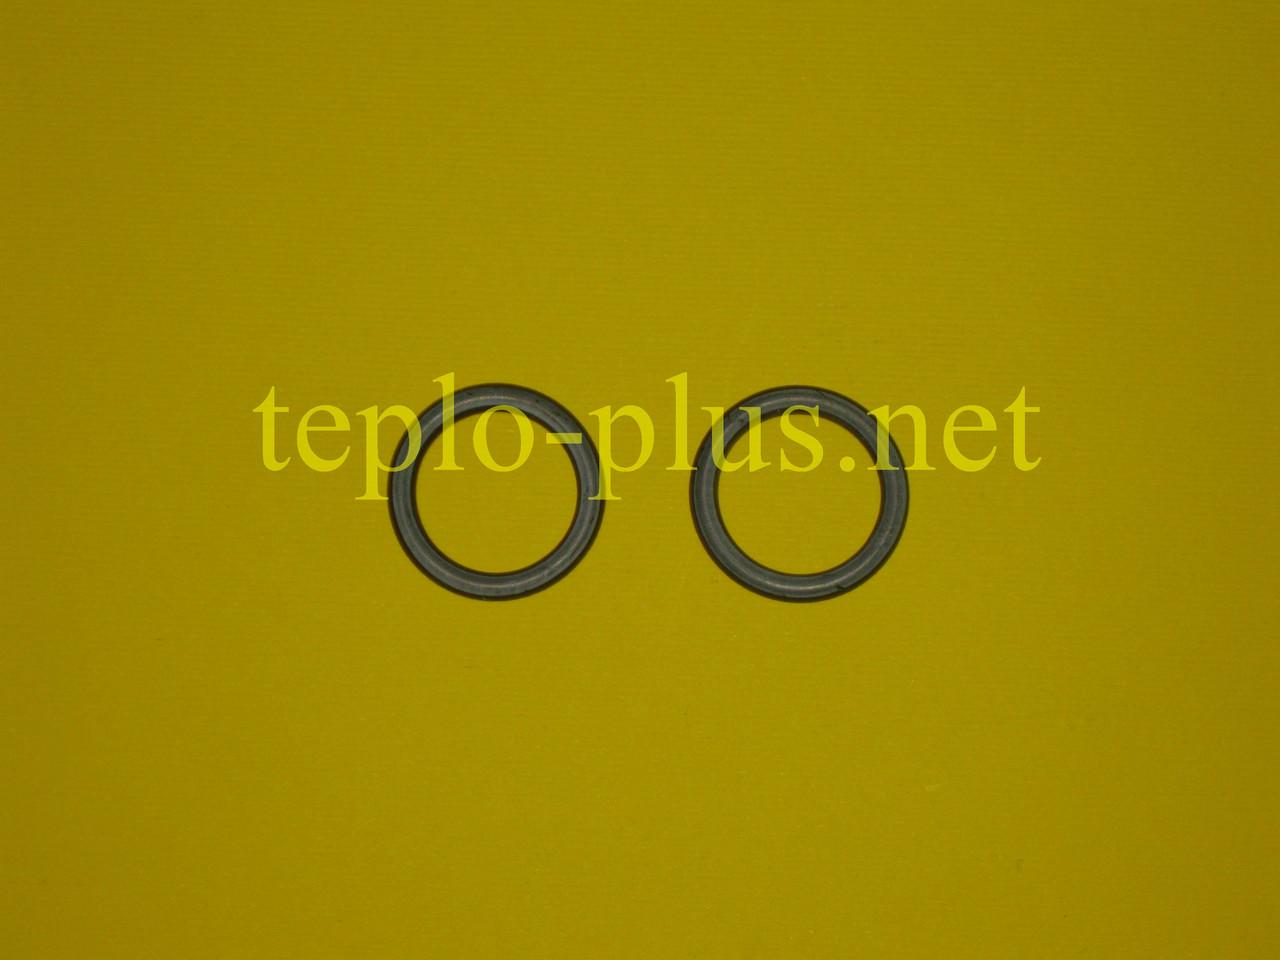 Комплект прокладок теплообменника первичного (основного) 103415 Vaillant ecoBLOCK, ecoTEC, ecoVIT, ecoCOMPACT, фото 2